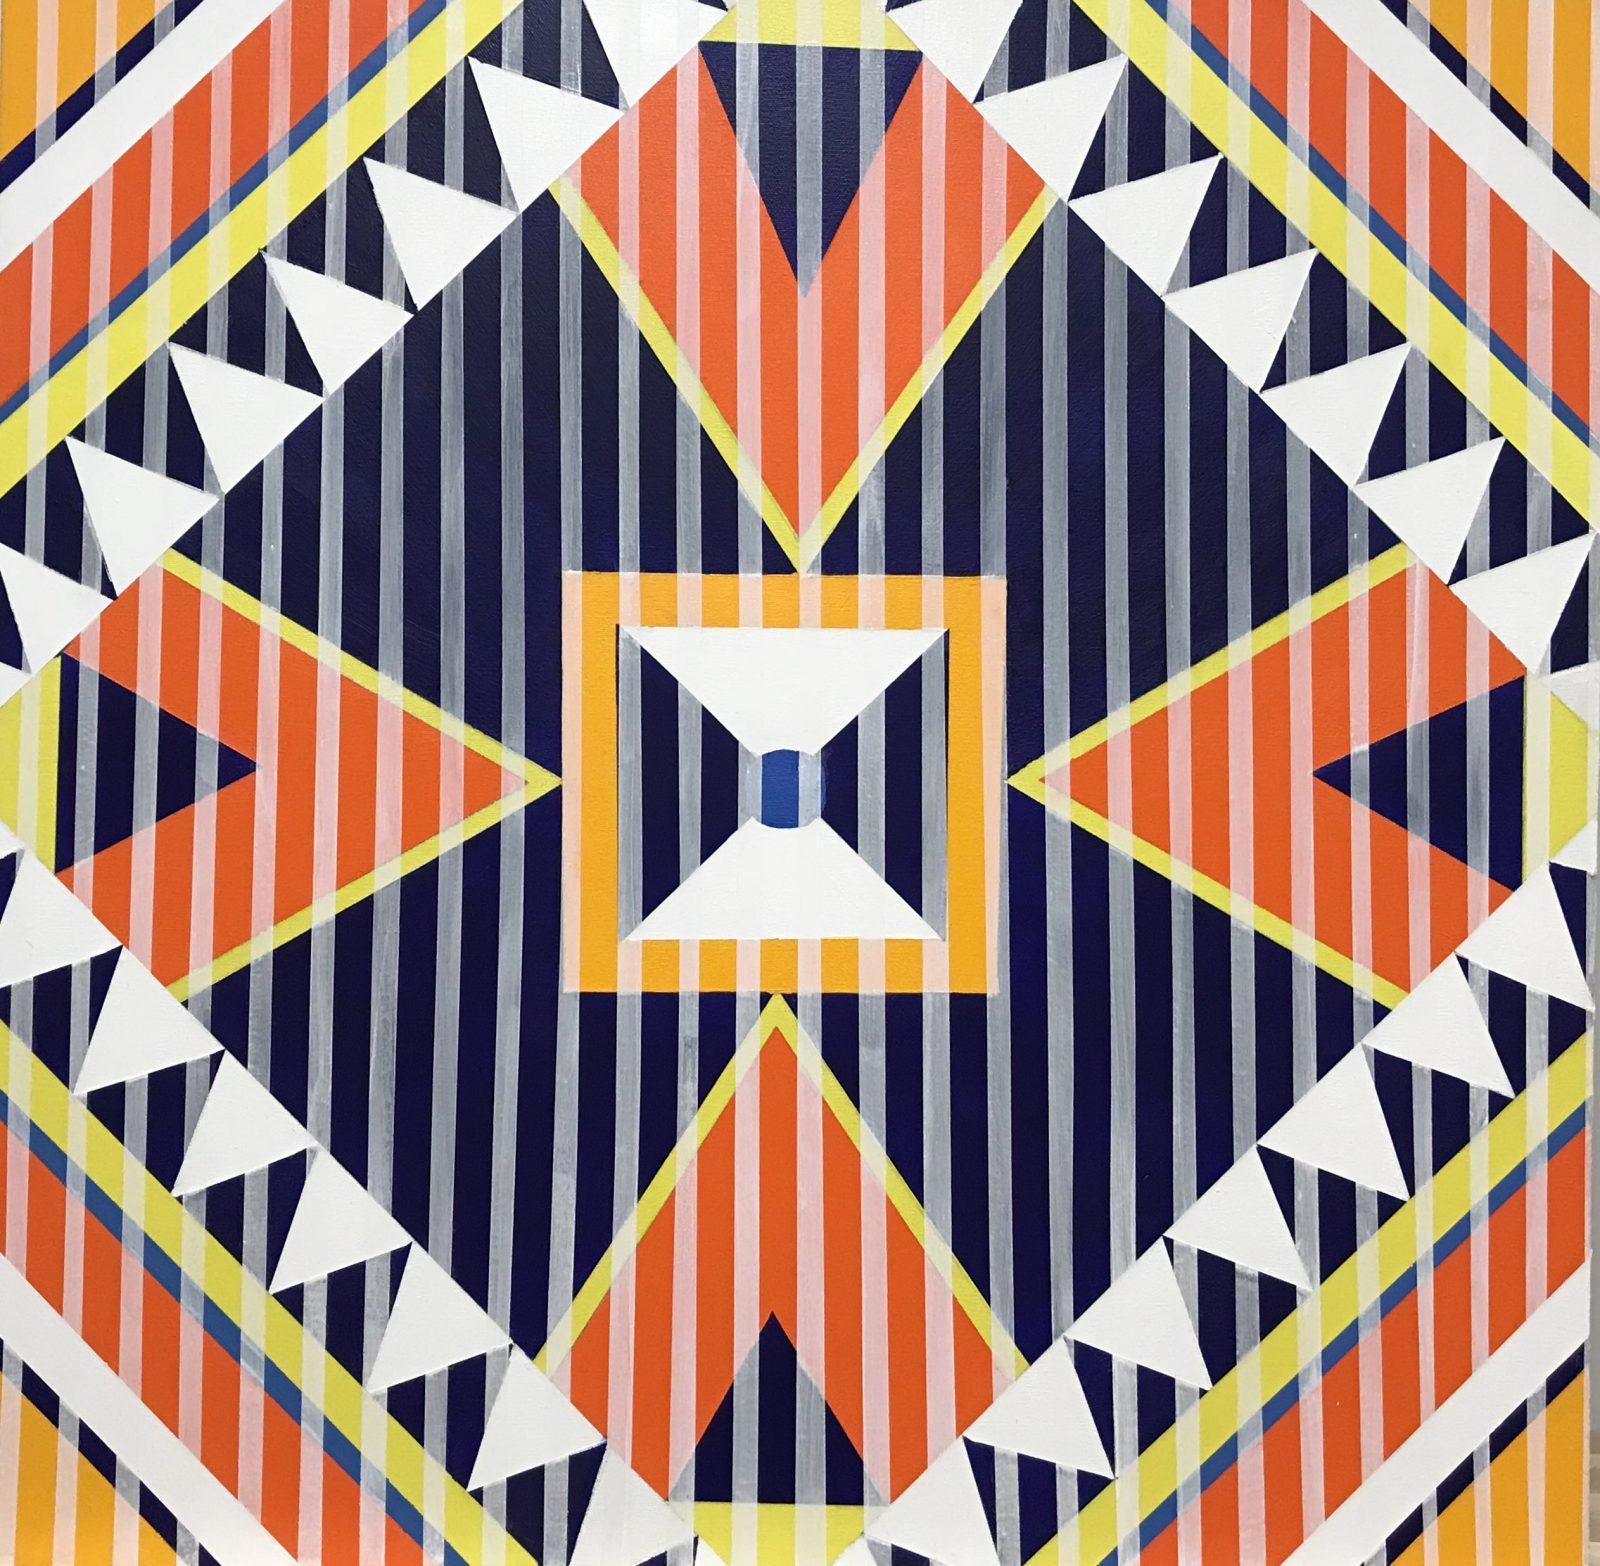 Colour Constructs artwork